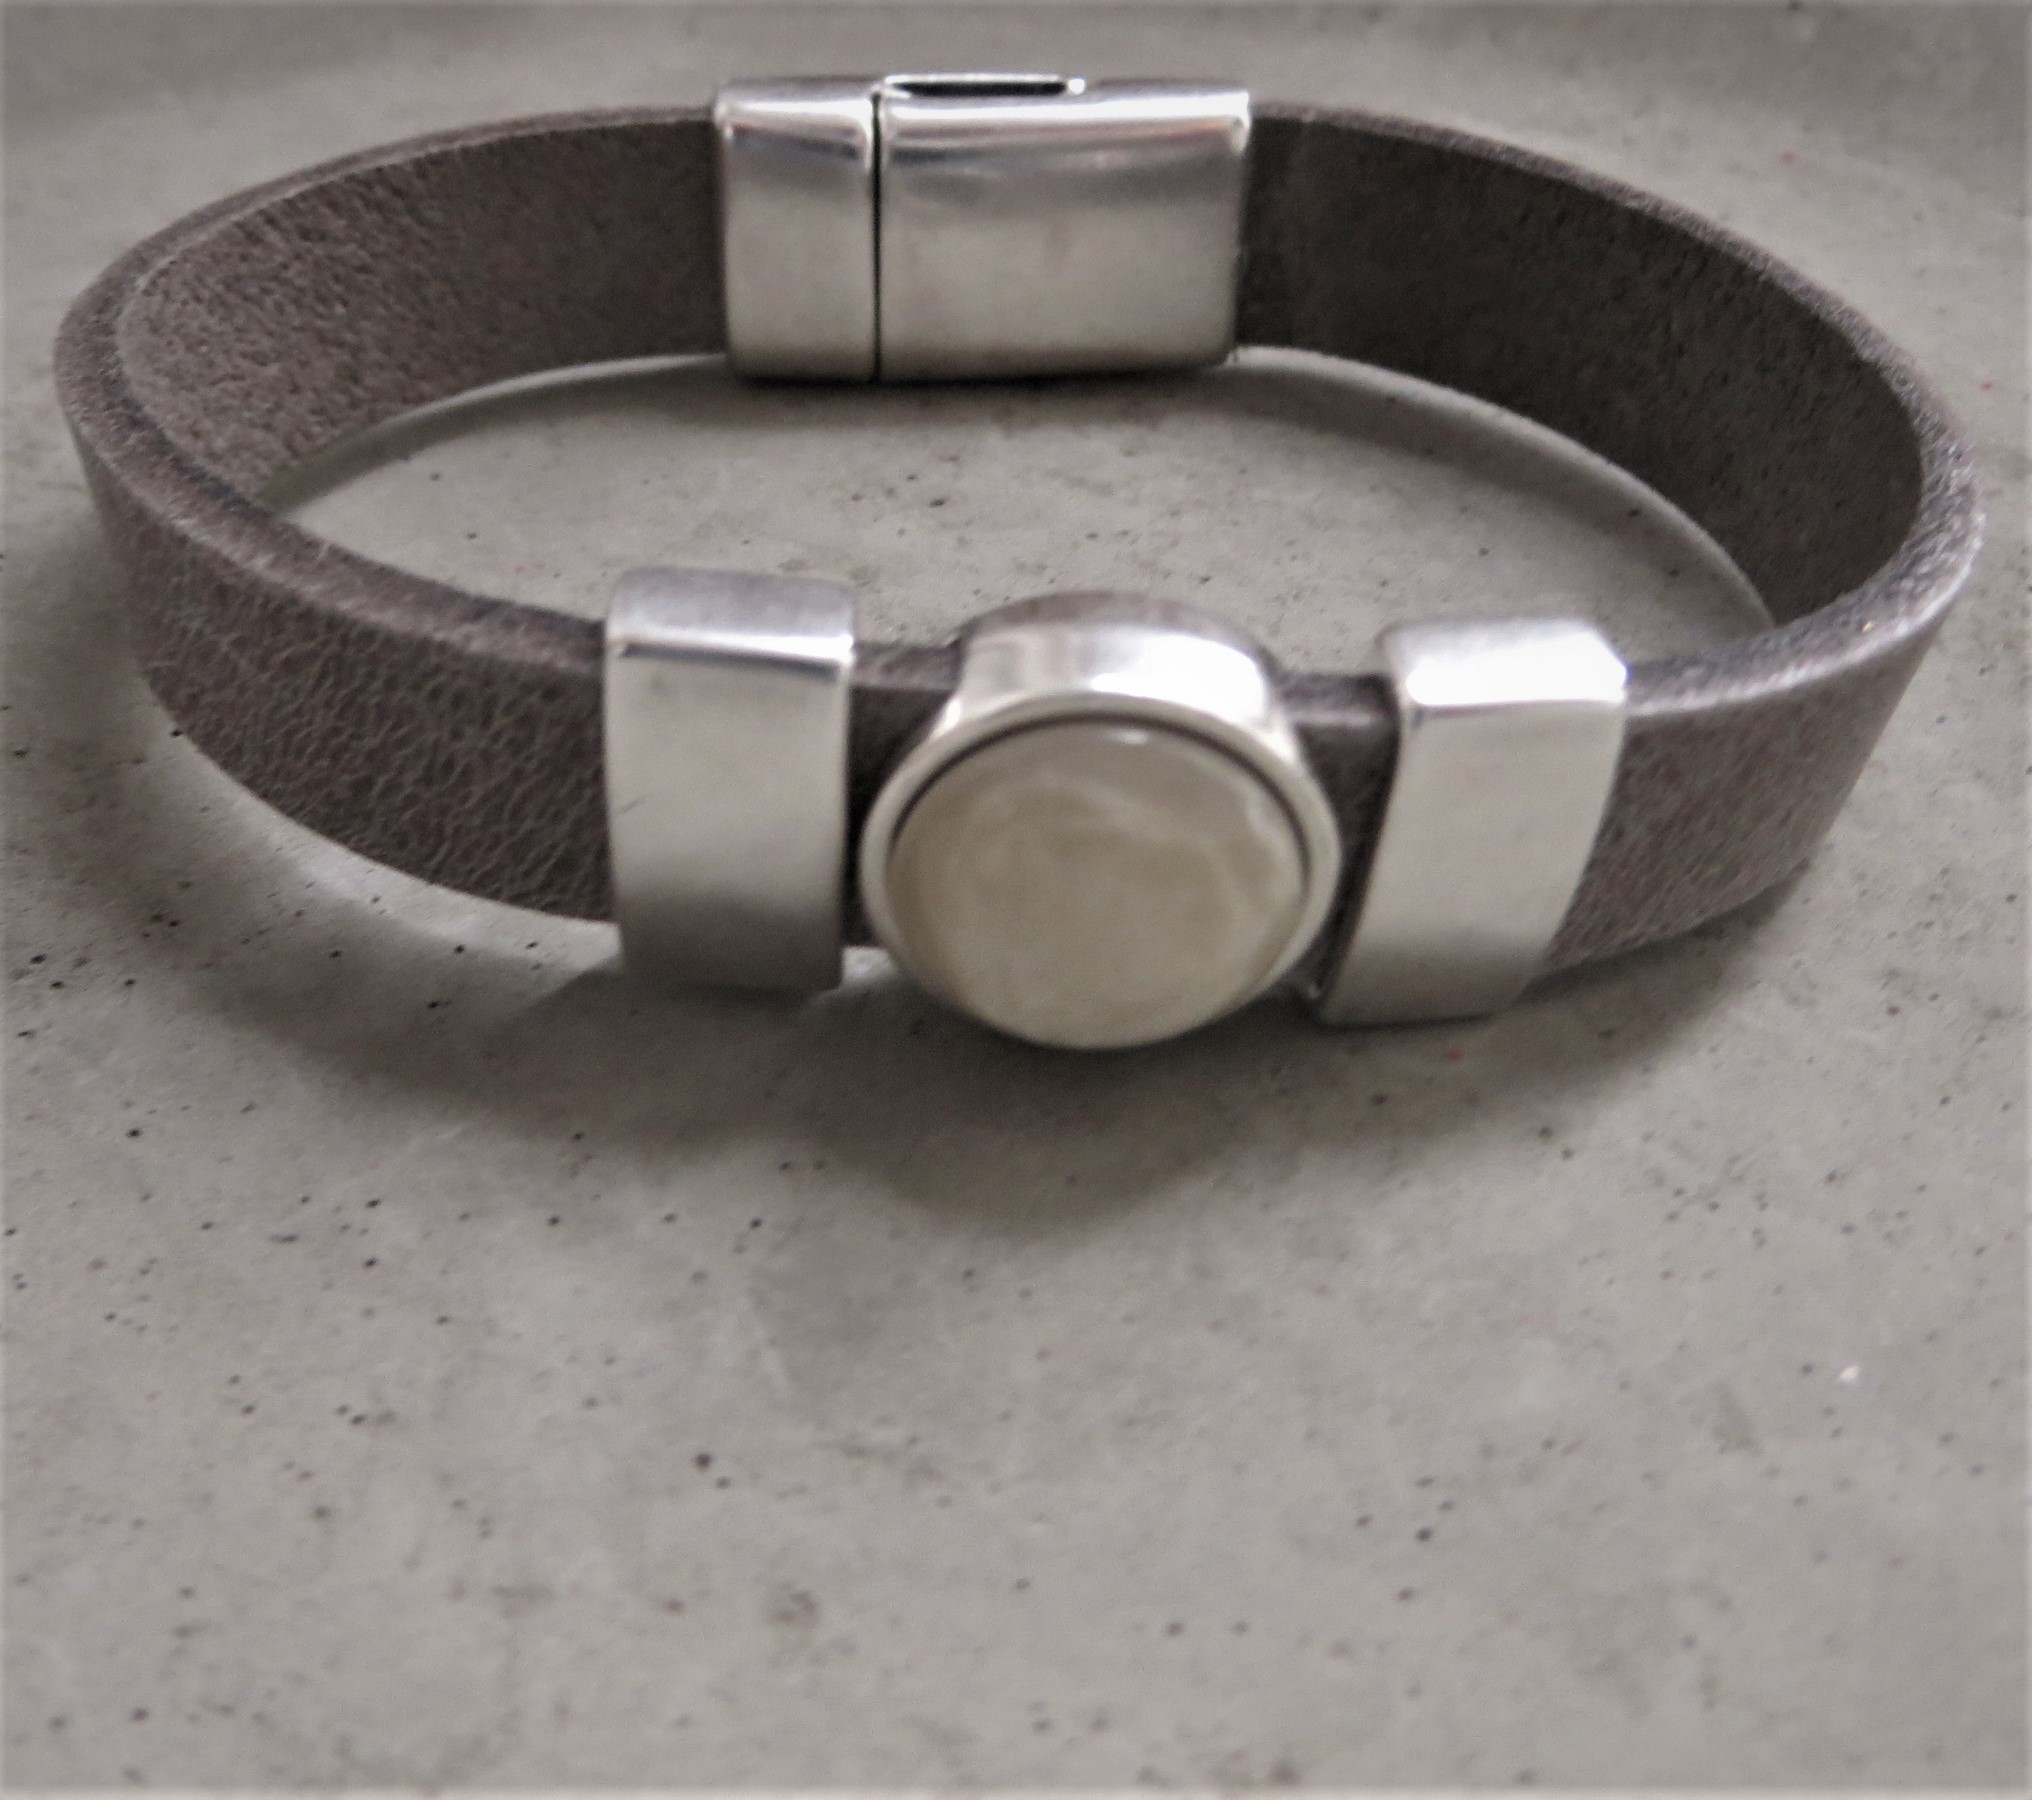 Armbaender - QOSS Armband KIM Grau Creme S  - Onlineshop Tante Emmer